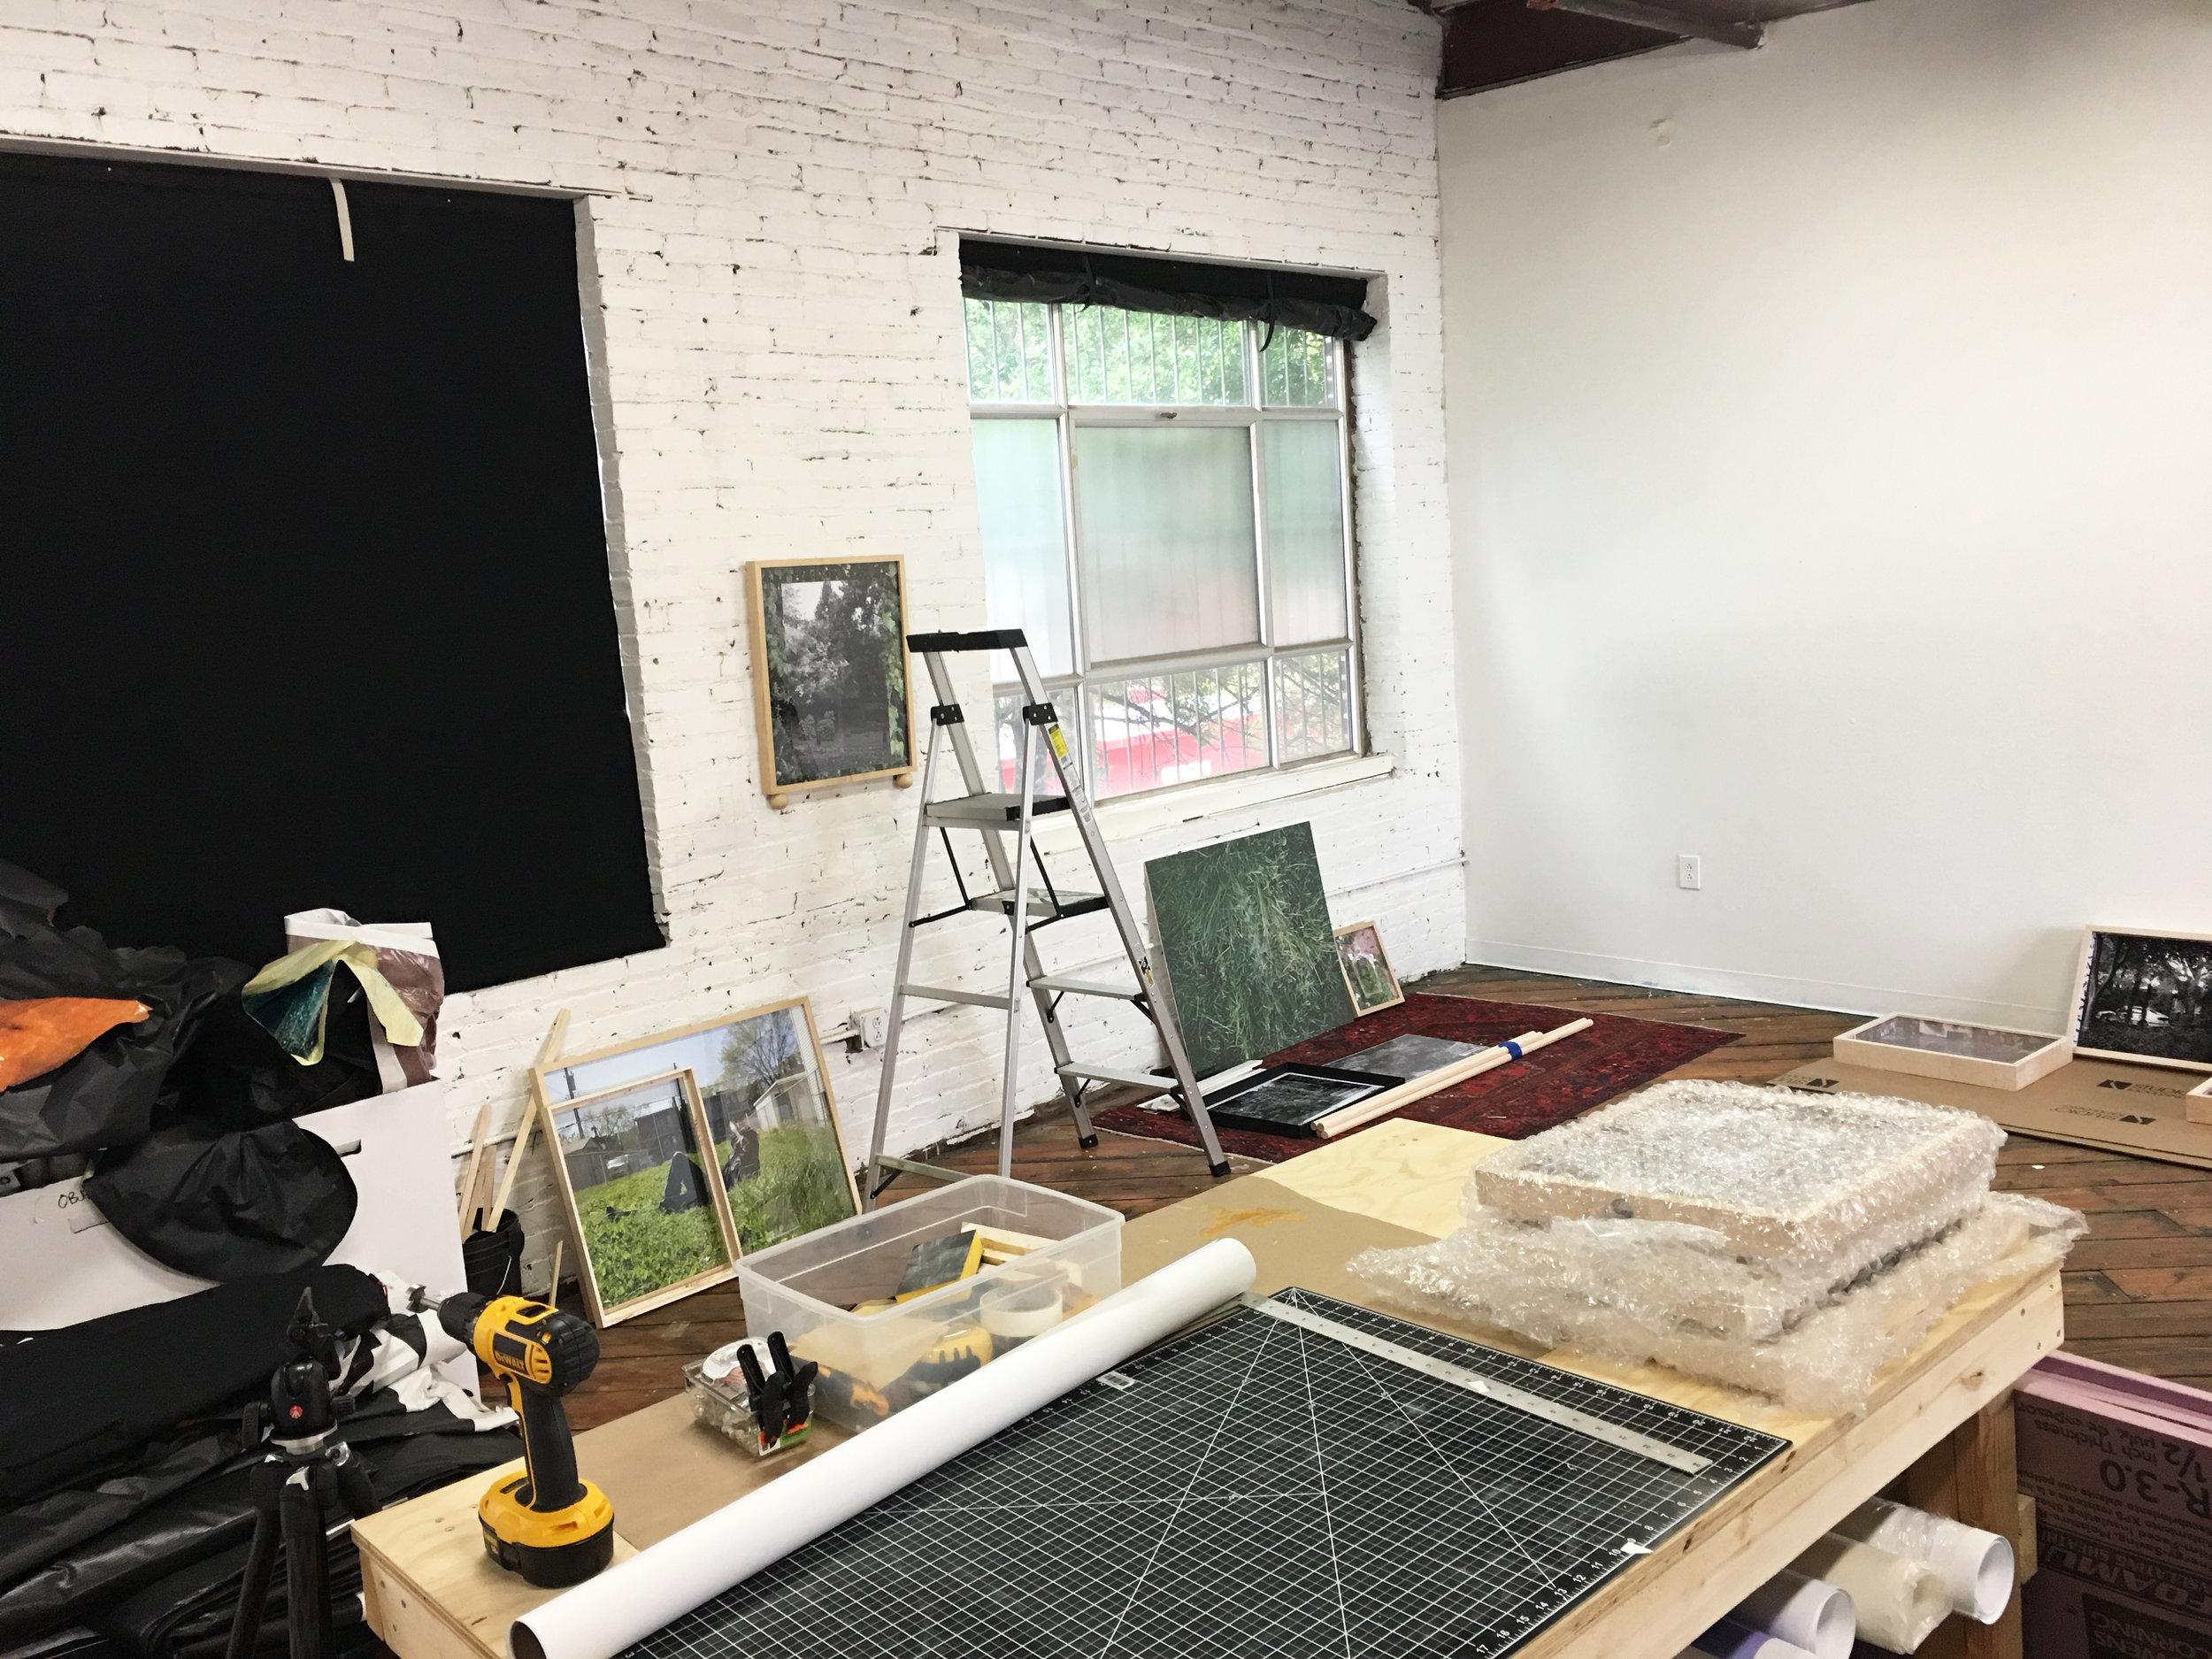 Kelly Kristin Jones' Studio at the Atlanta Contemporary